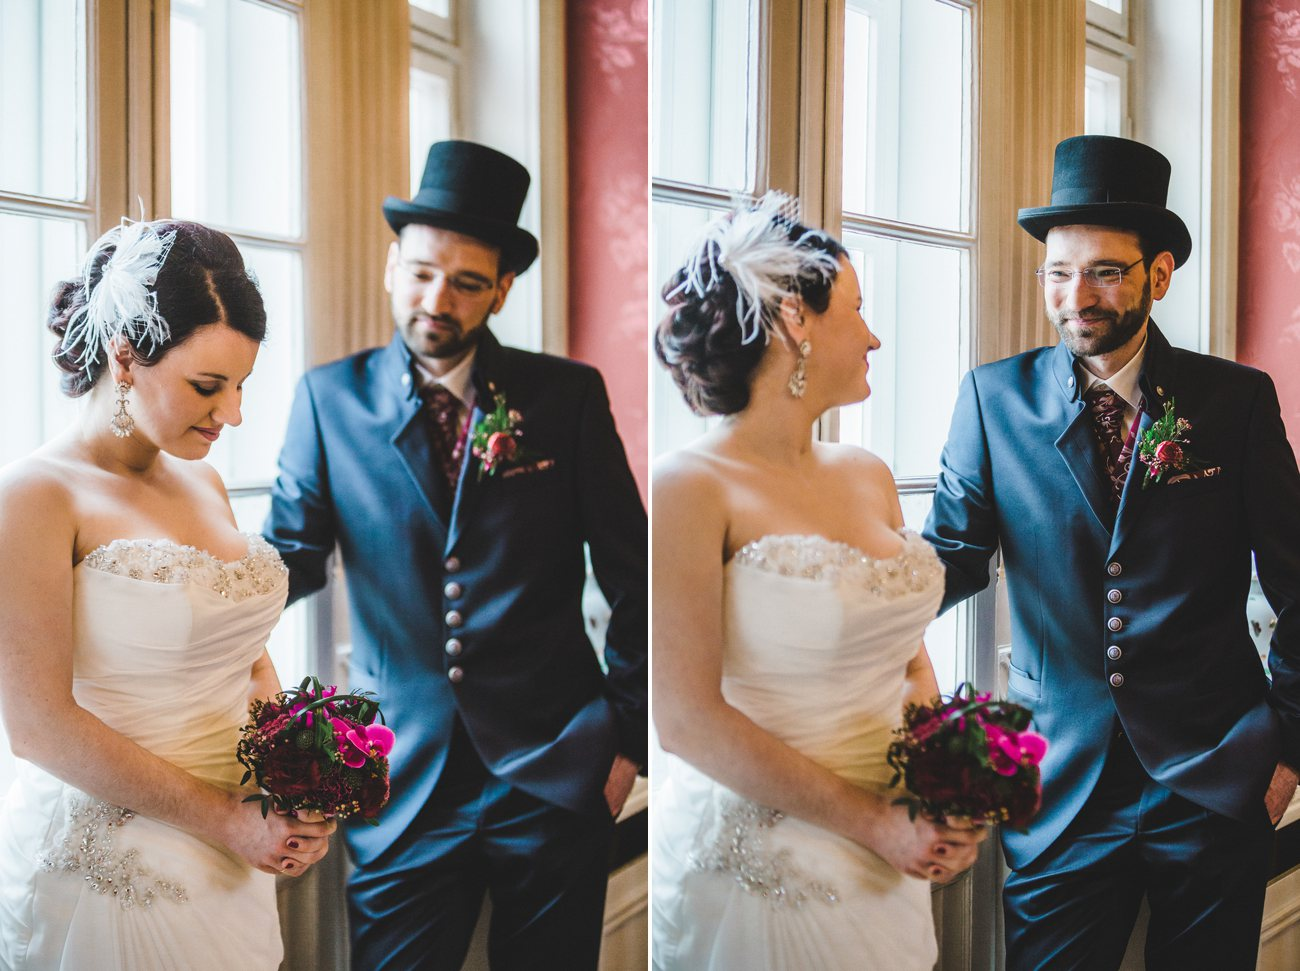 Hochzeitsfotograf_Schloss_Luebbenau 29